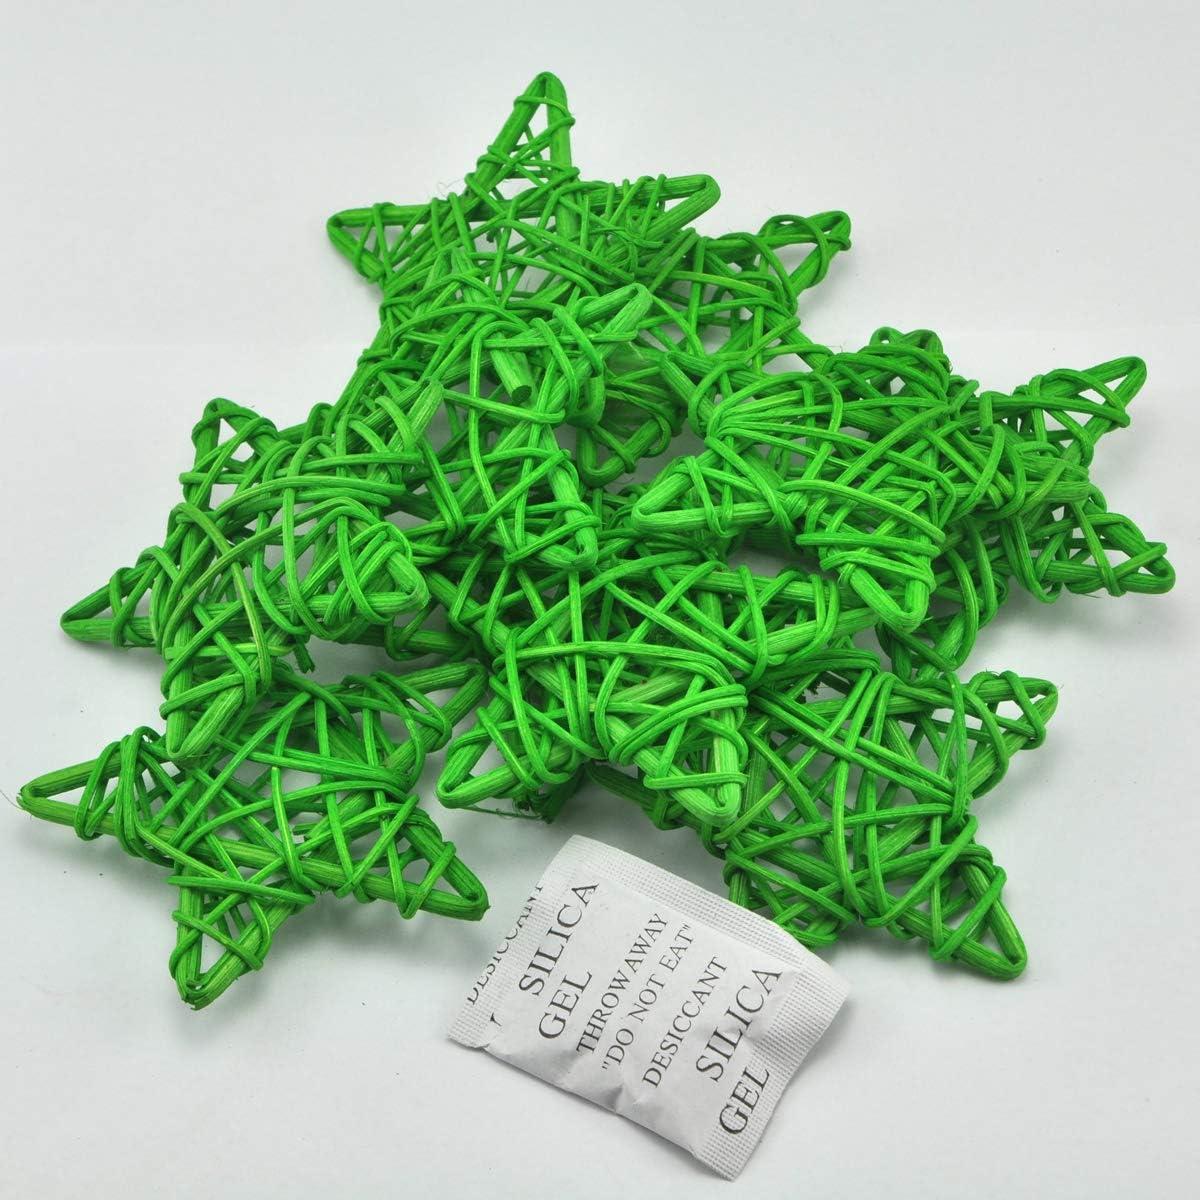 LTD. Ougual 6PCS 6 Natural Color Wicker Rattan Vine Stars for Home Garden Wreath Tree Decoration ShenZhen Aigua Technology Co